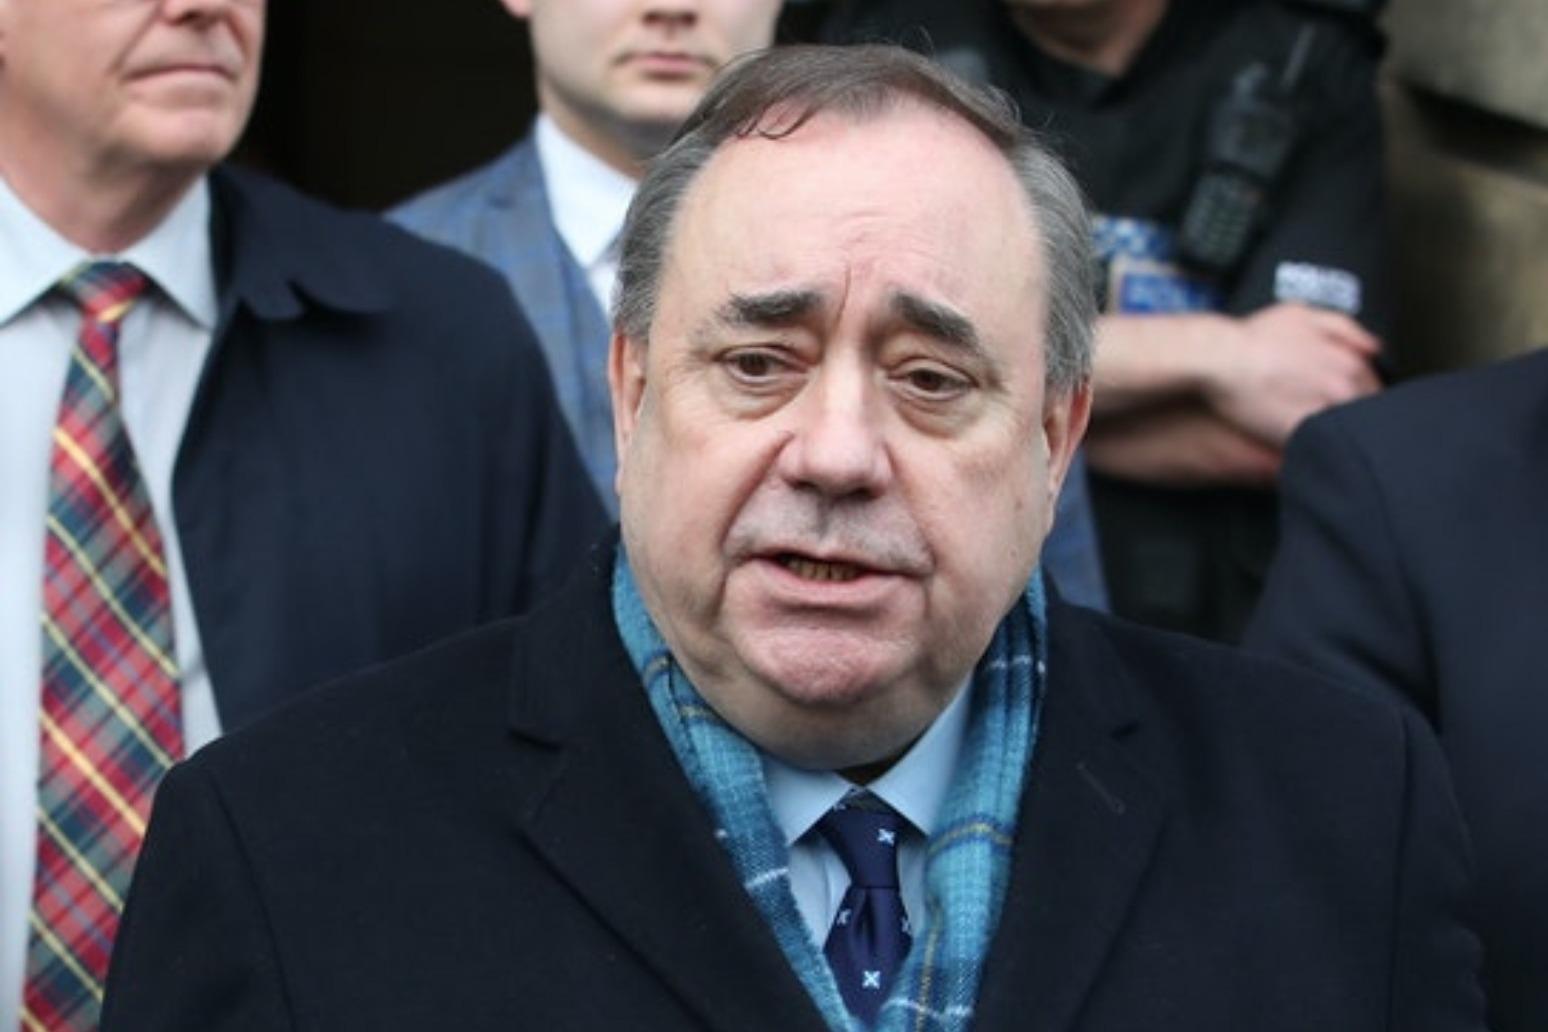 Senior civil servants to appear before Salmond inquiry